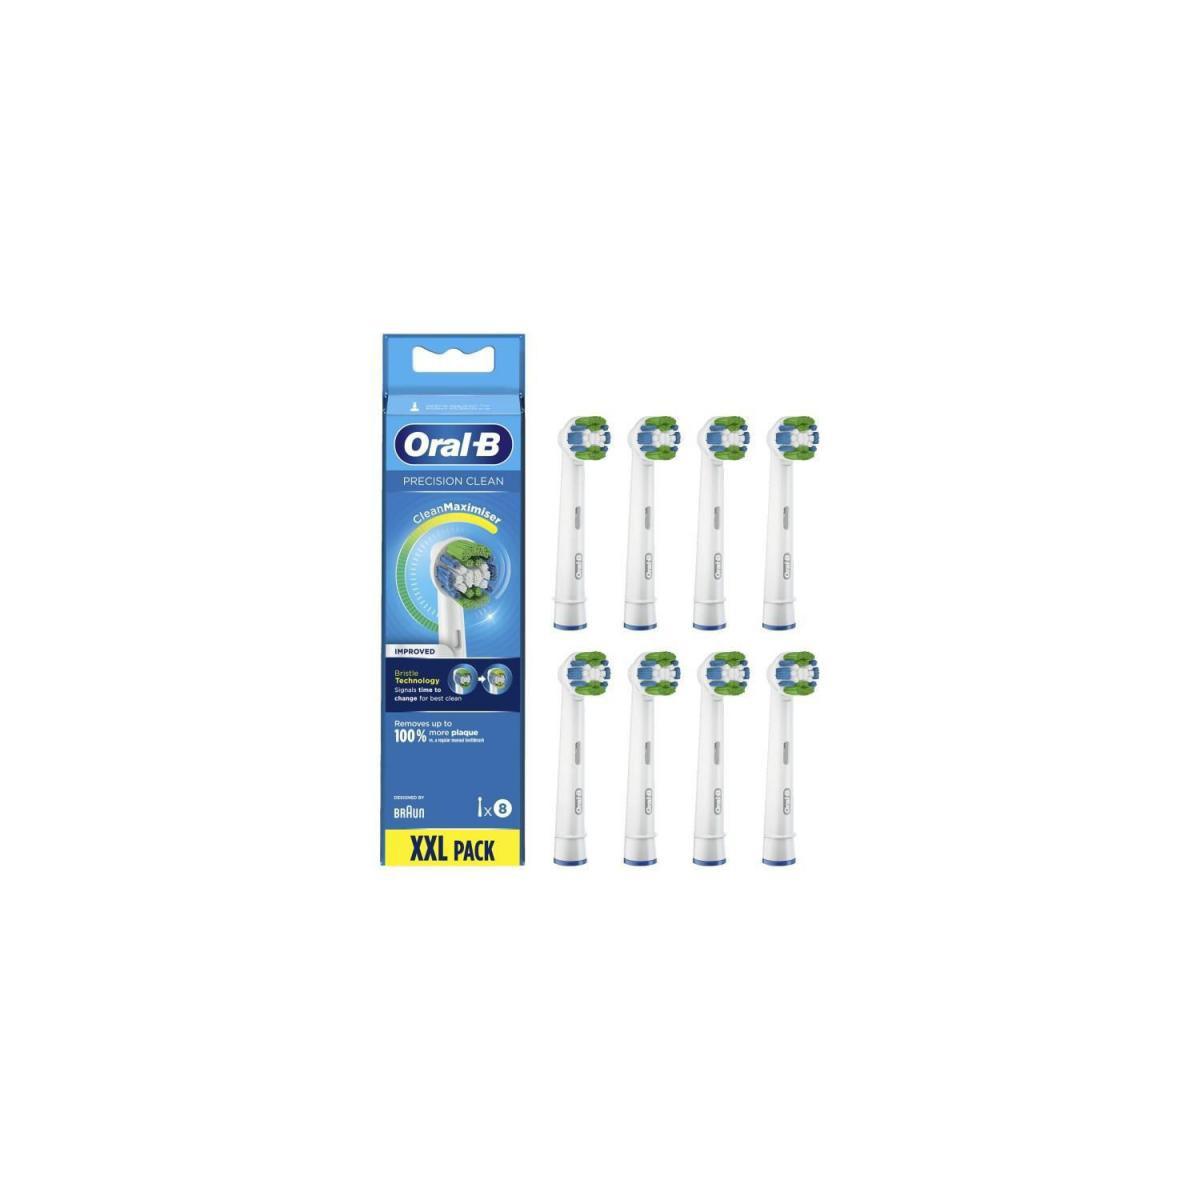 Oral-B Oral-B Precision Clean Brossette Avec CleanMaximiser, 8